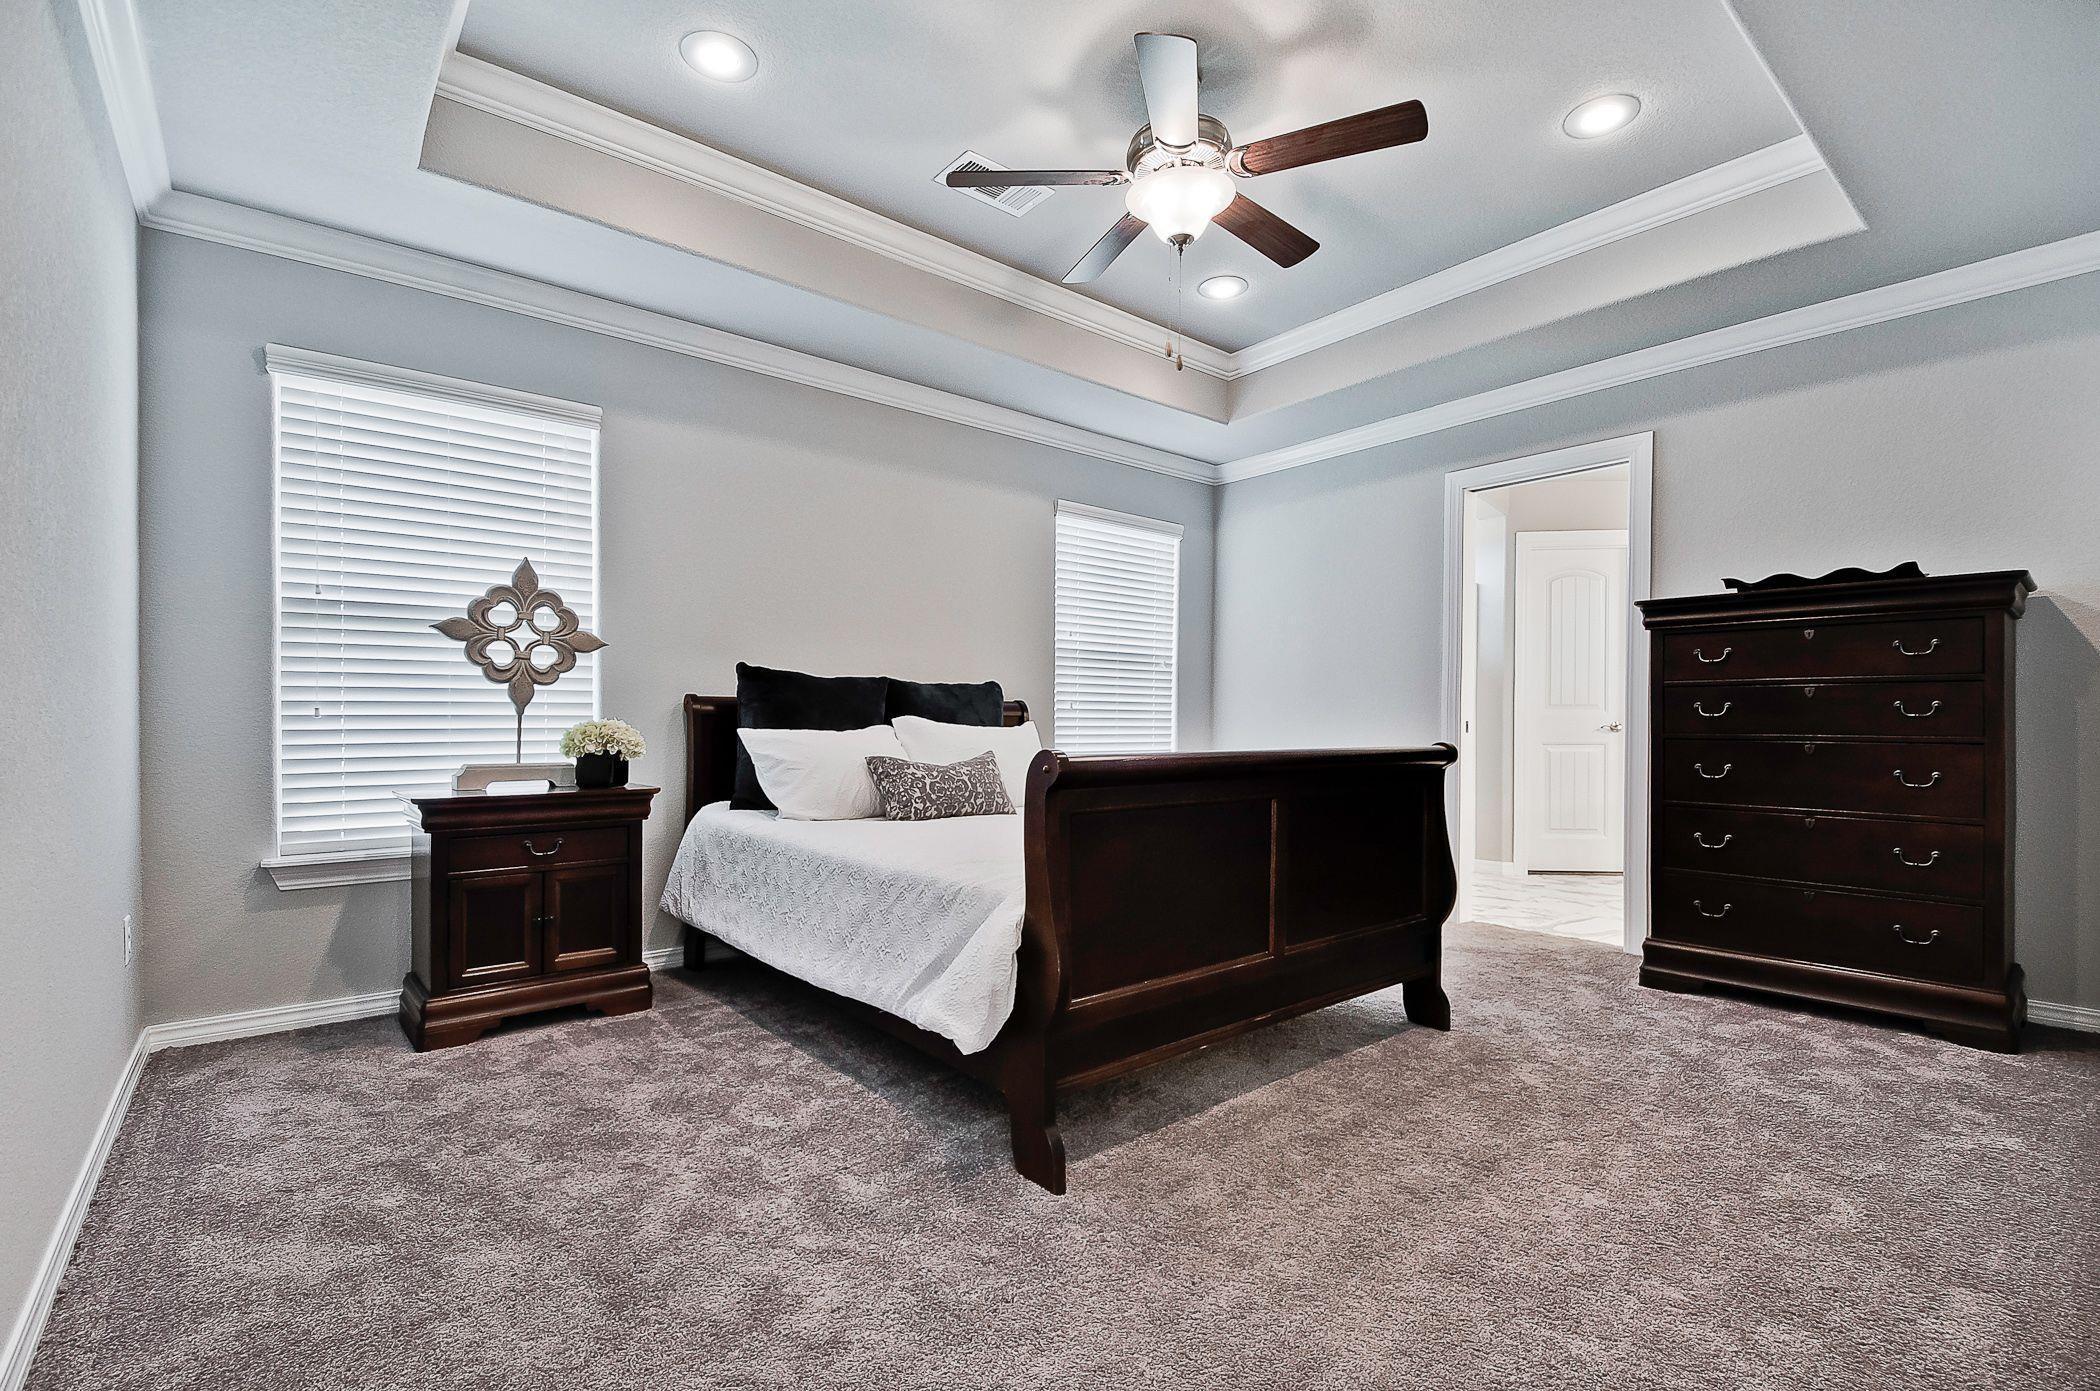 Bedroom featured in the Oak 1463 By Riverwood Homes - Arkansas in Fayetteville, AR